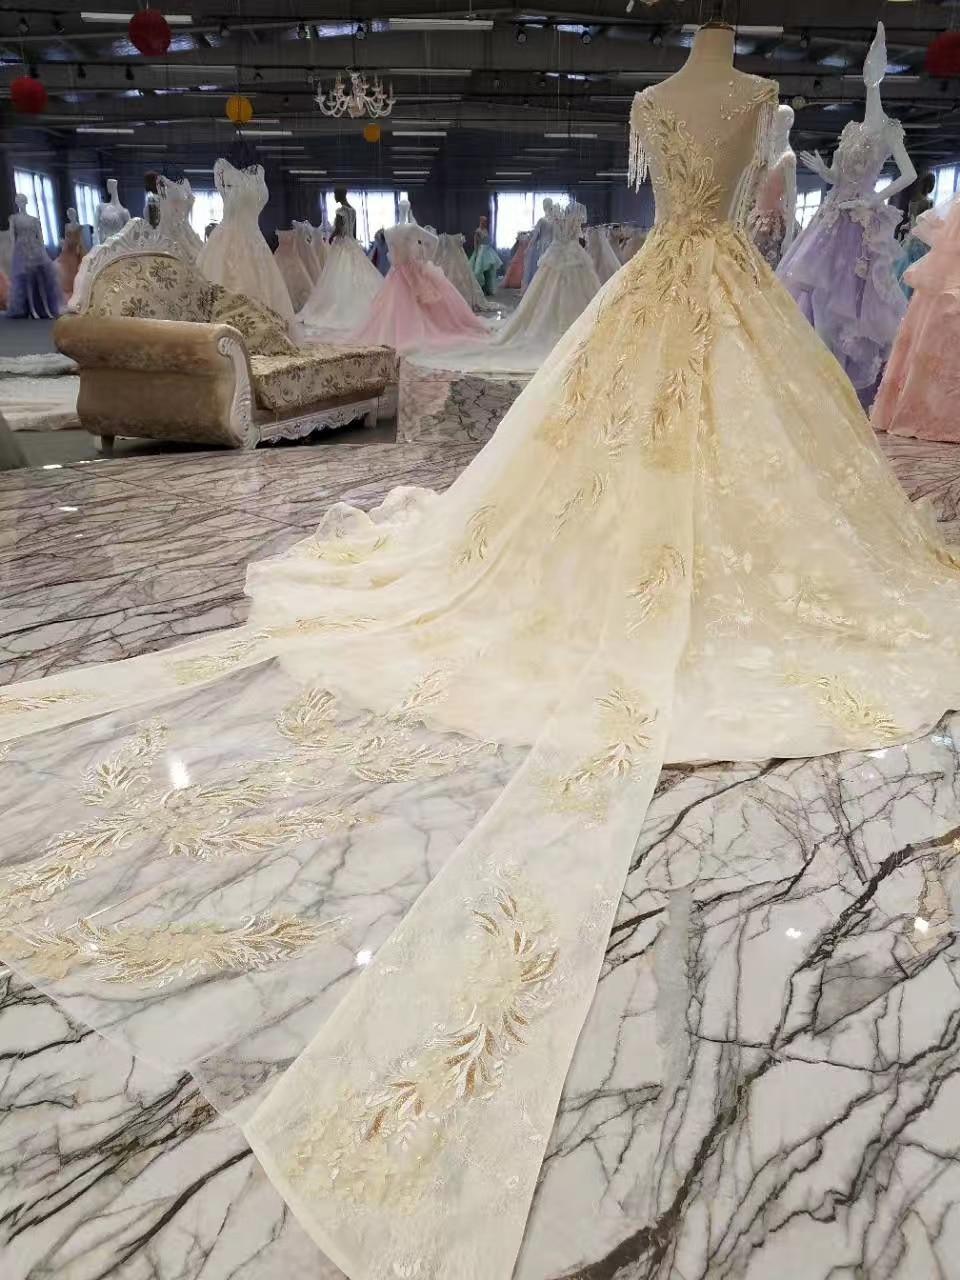 Lace Crystals de lux Margele de aplicatii rochie de mireasa rochie de - Rochii de mireasa - Fotografie 6